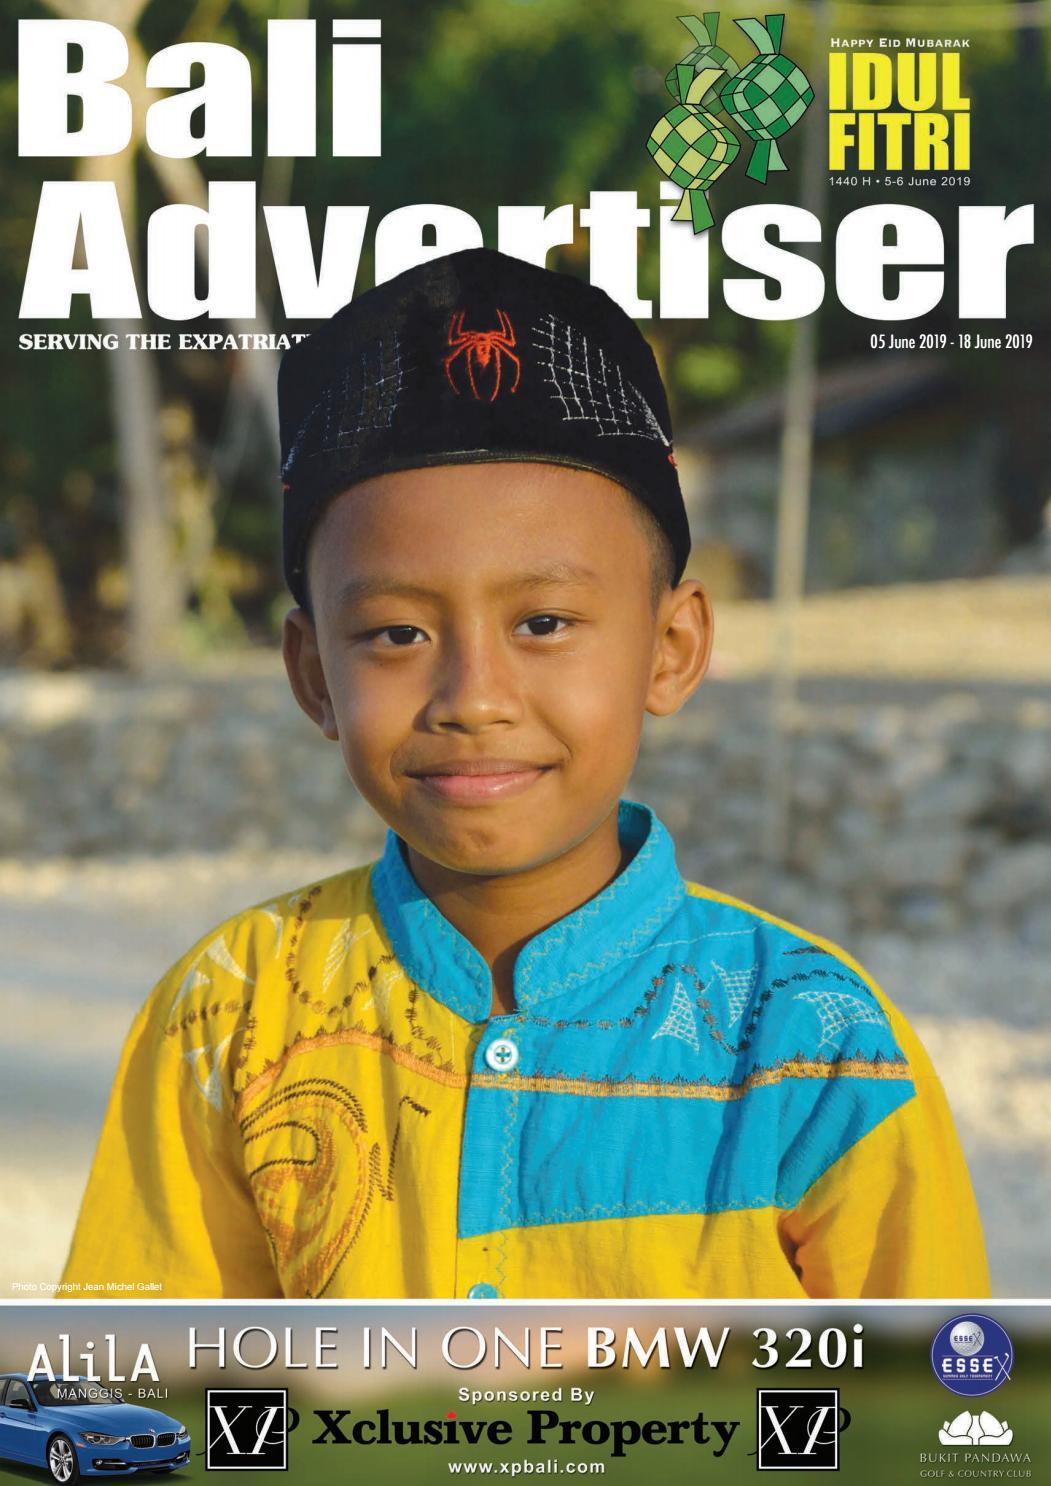 Bali Advertiser 05 June 2019 By Bali Advertiser Issuu